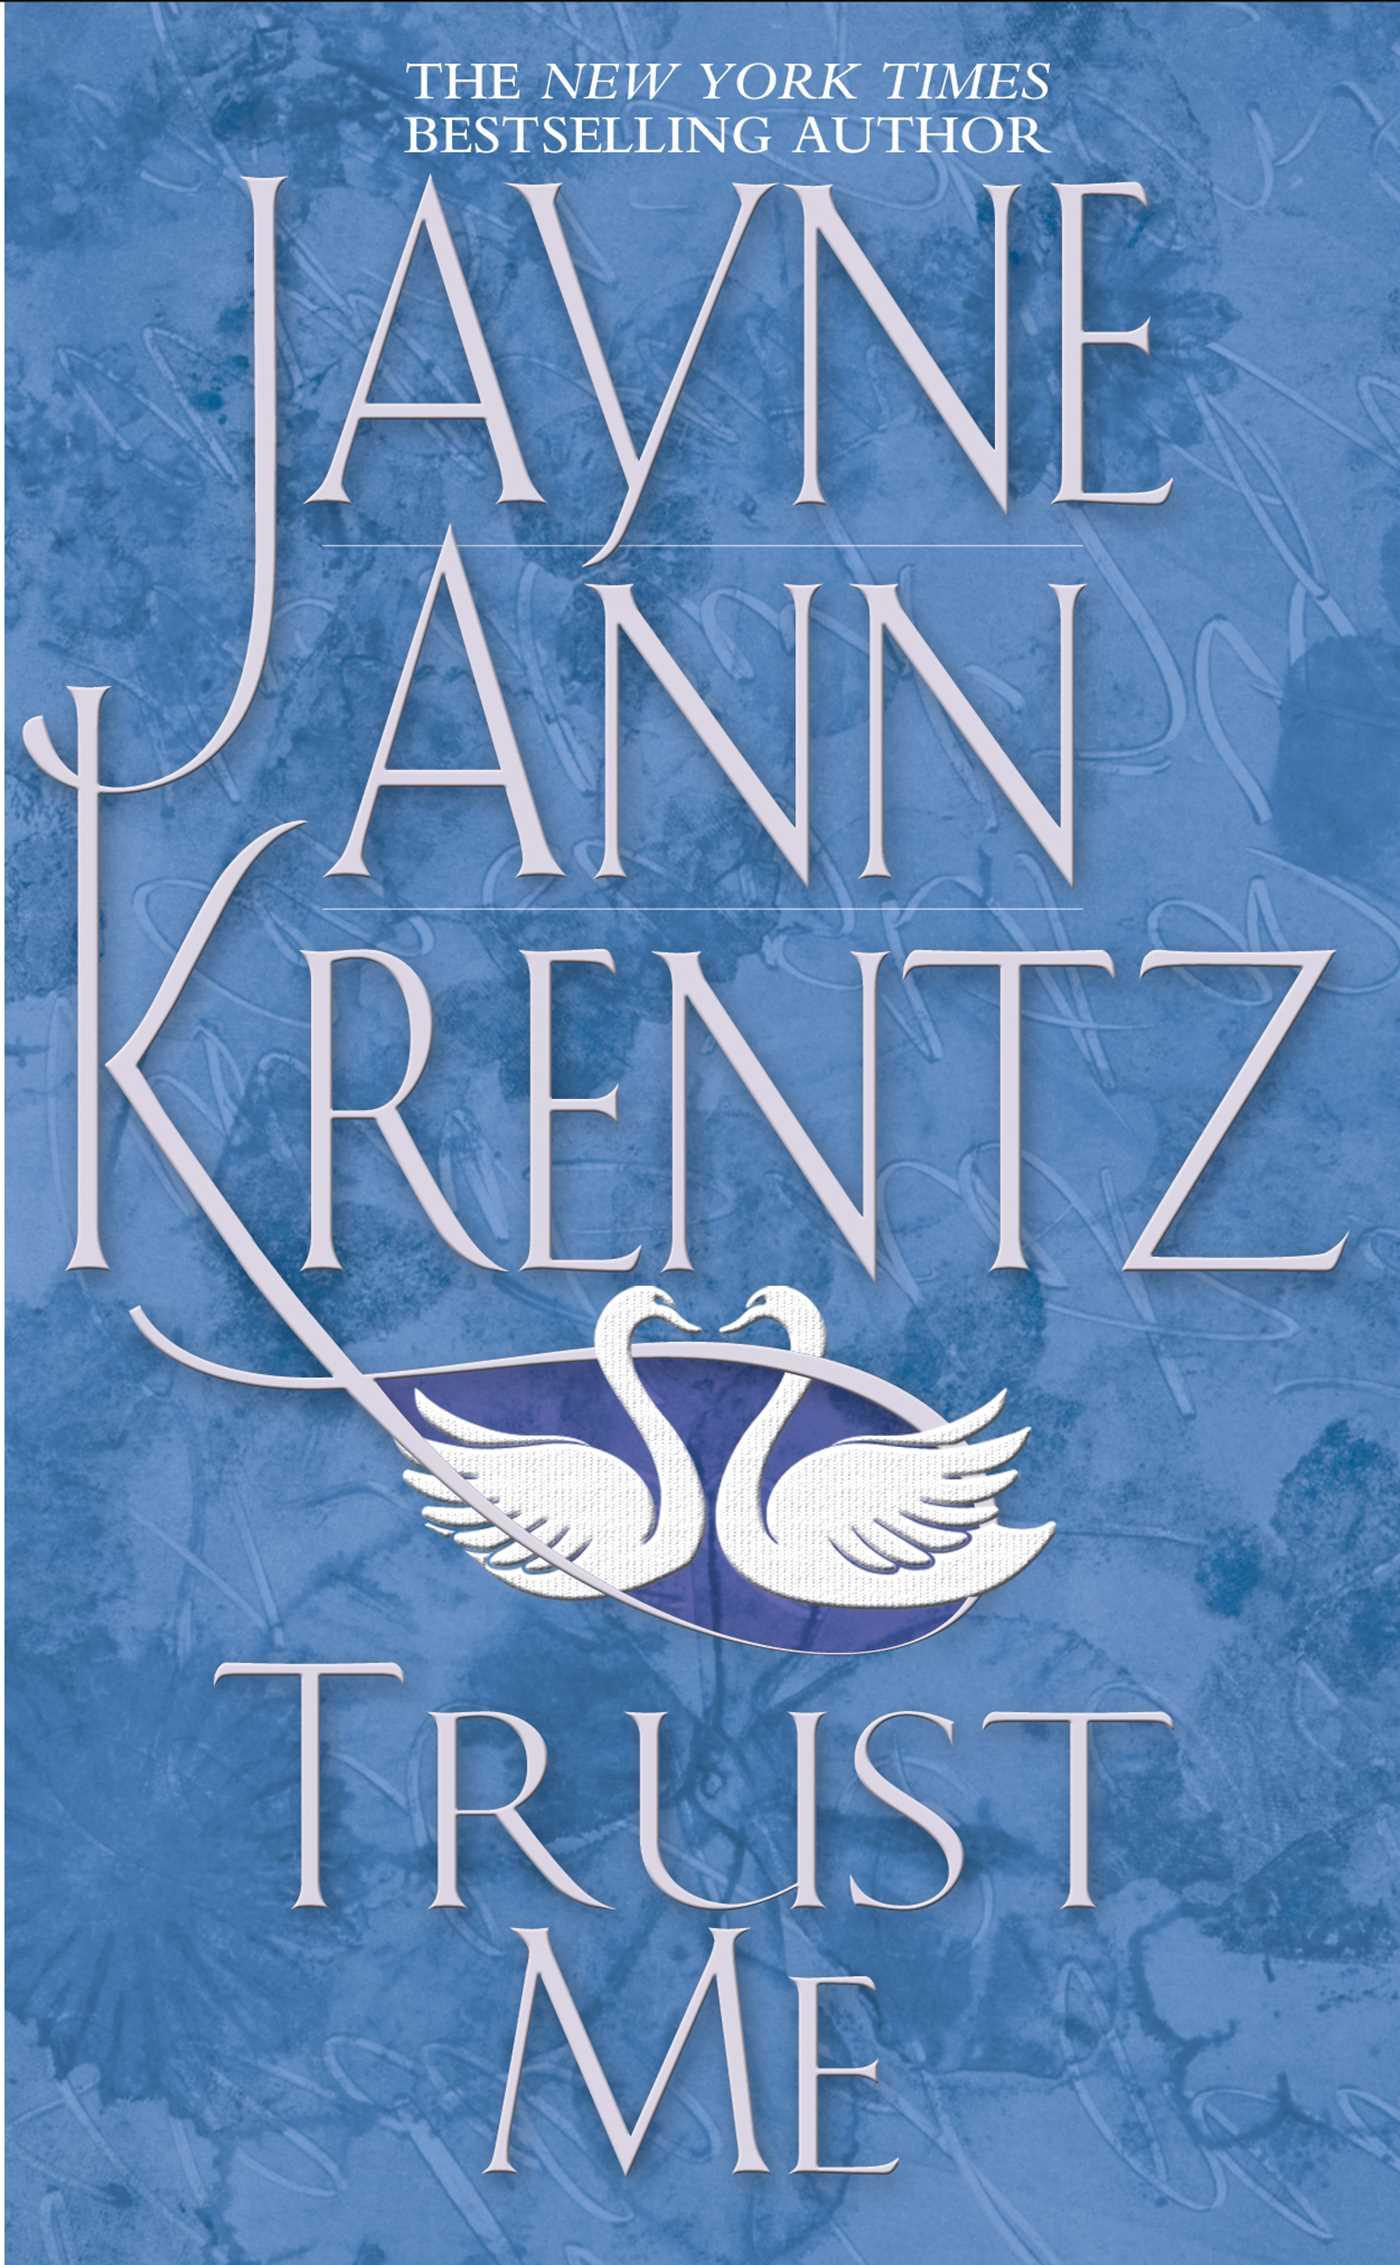 Trust Me   Book by Jayne Ann Krentz   Official Publisher ...